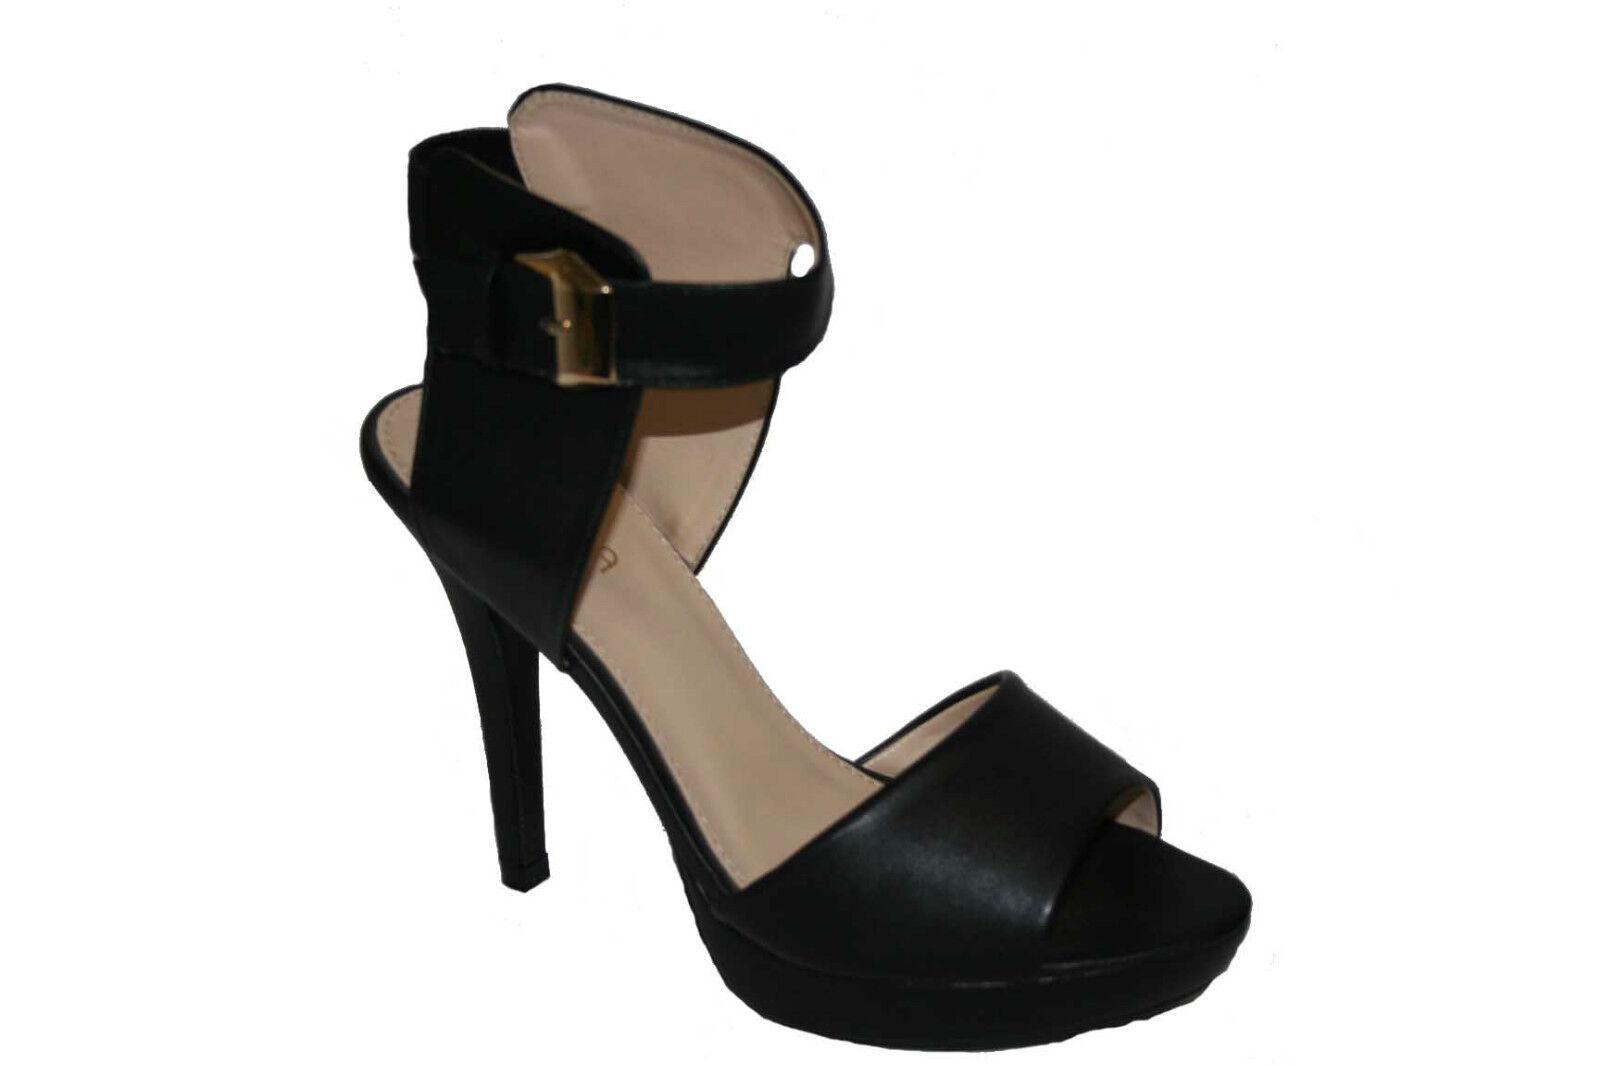 Moda jest prosta i niedroga  black leather look ankle strap stilleto  heel party wedding present gift prom